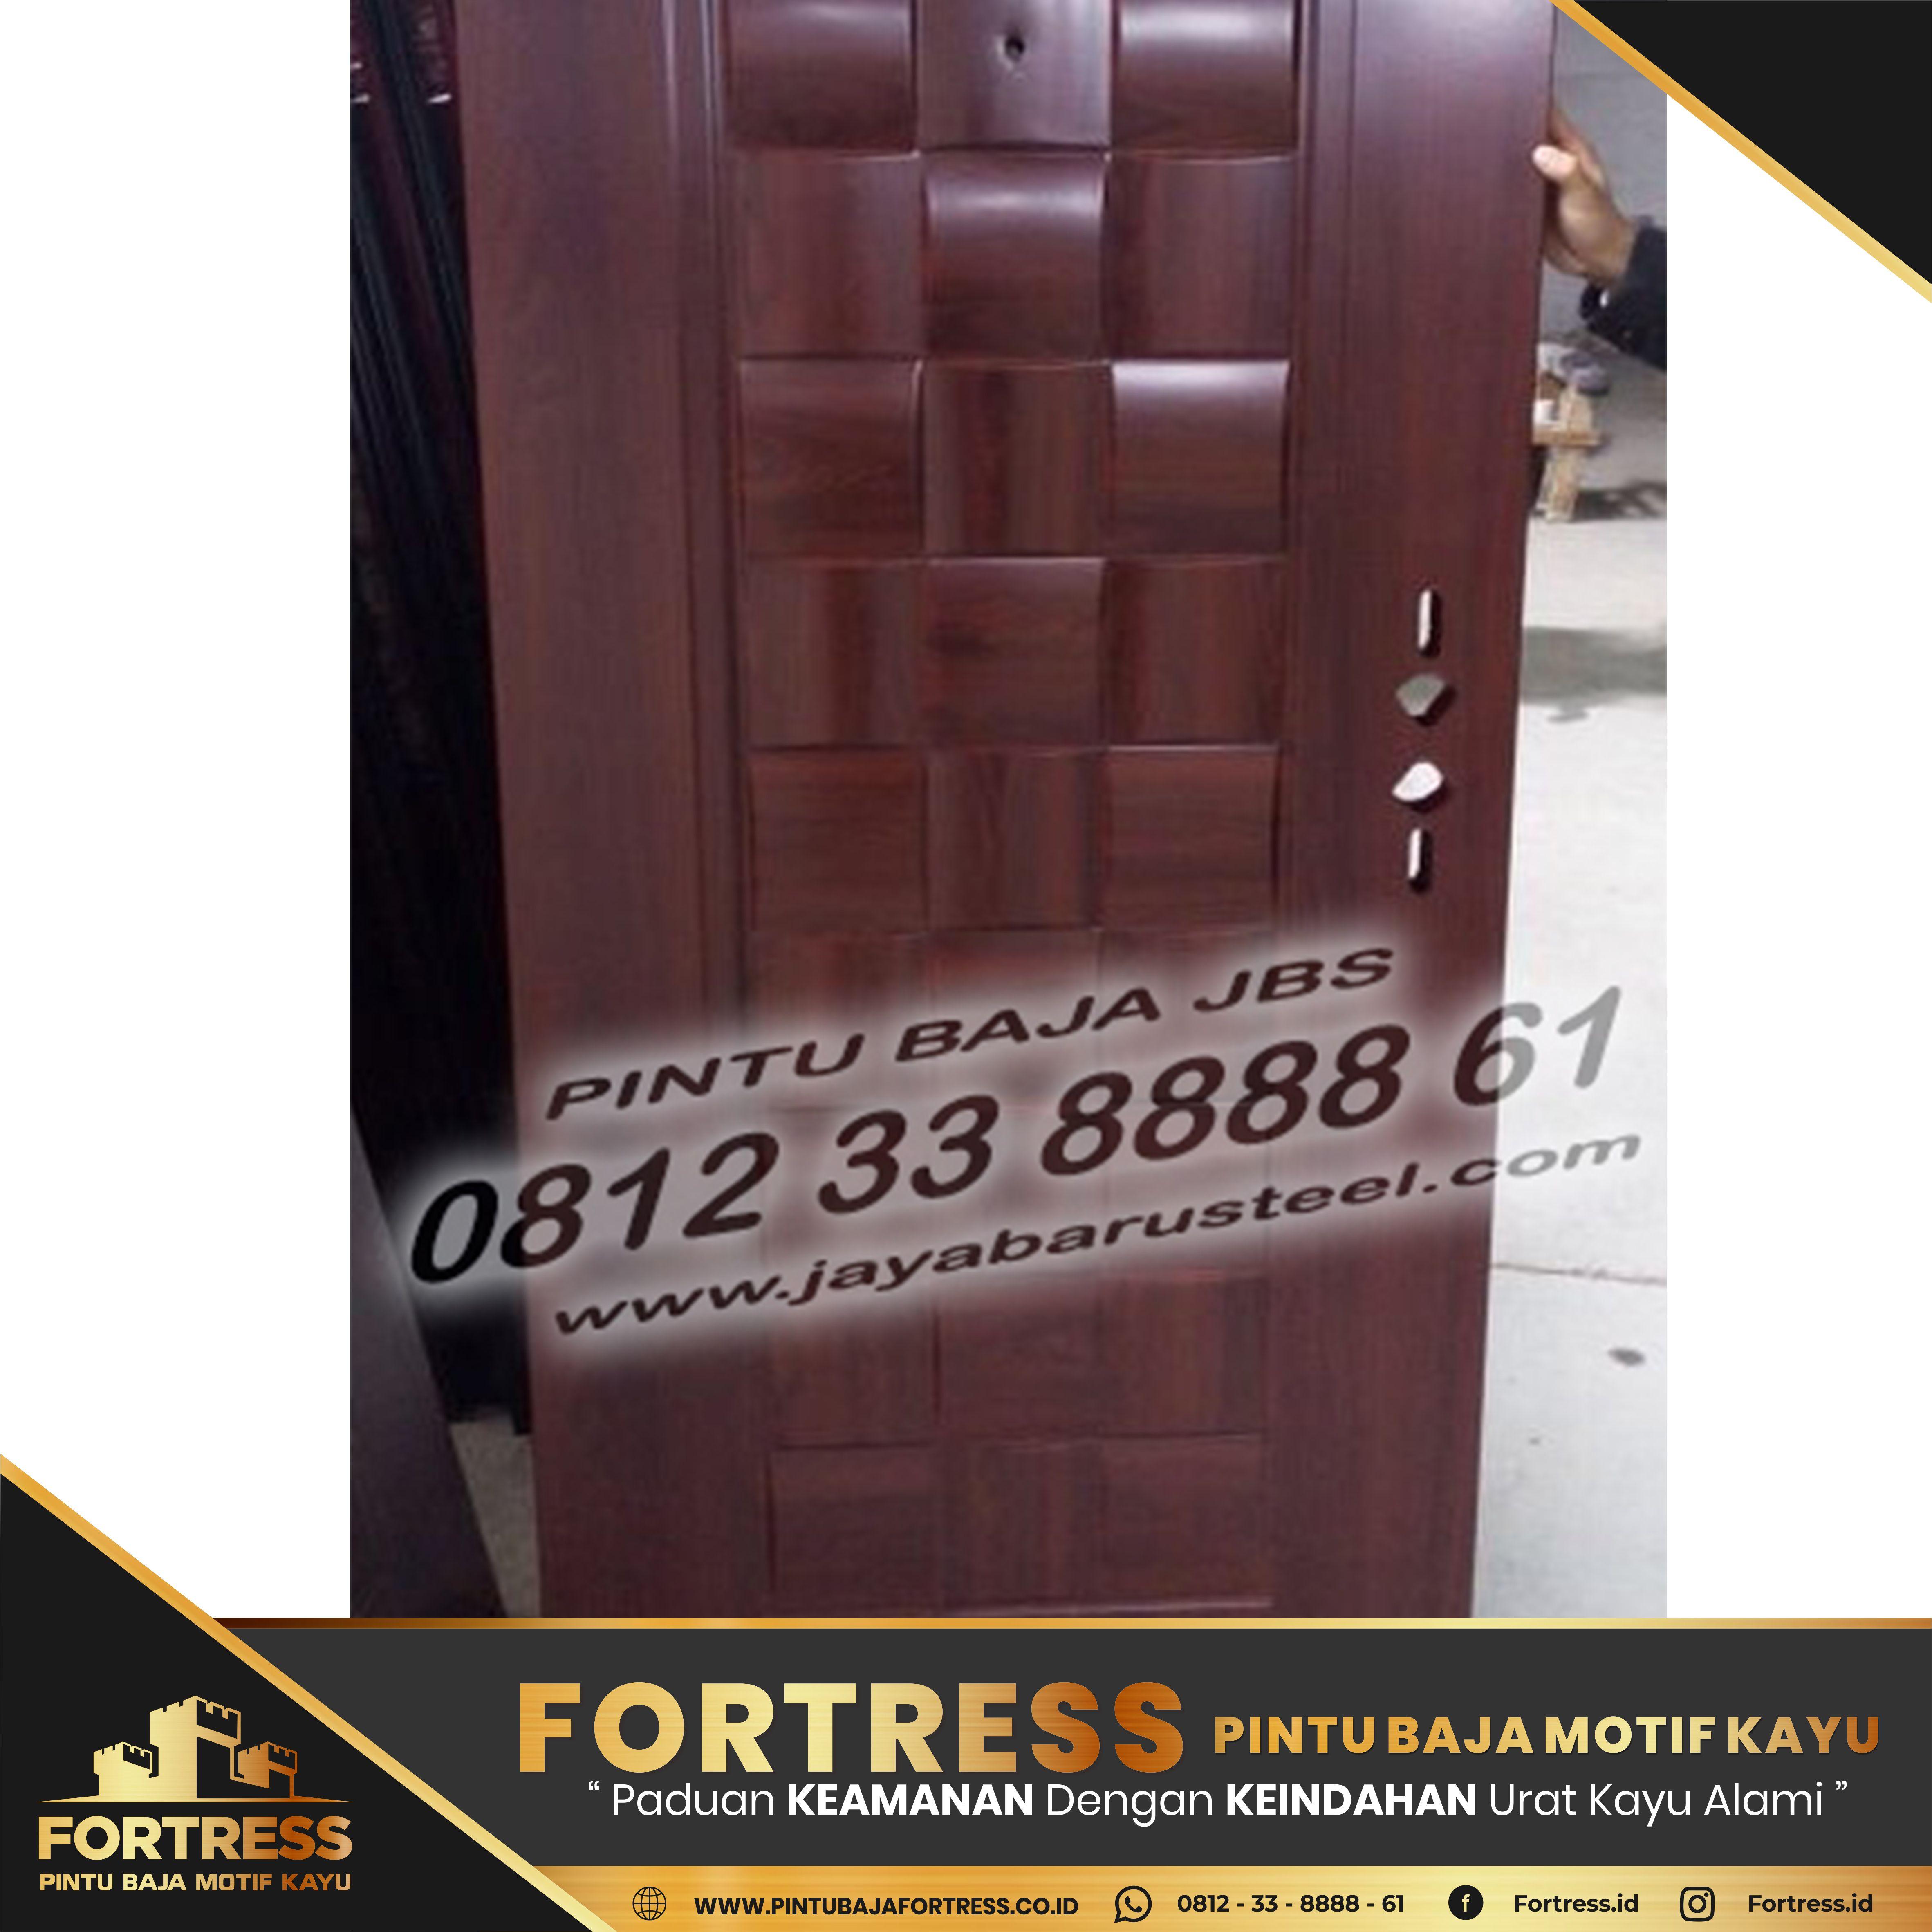 0812-91-6261-07 (FORTRESS) Banjar Masin Steel Iron Doors, …